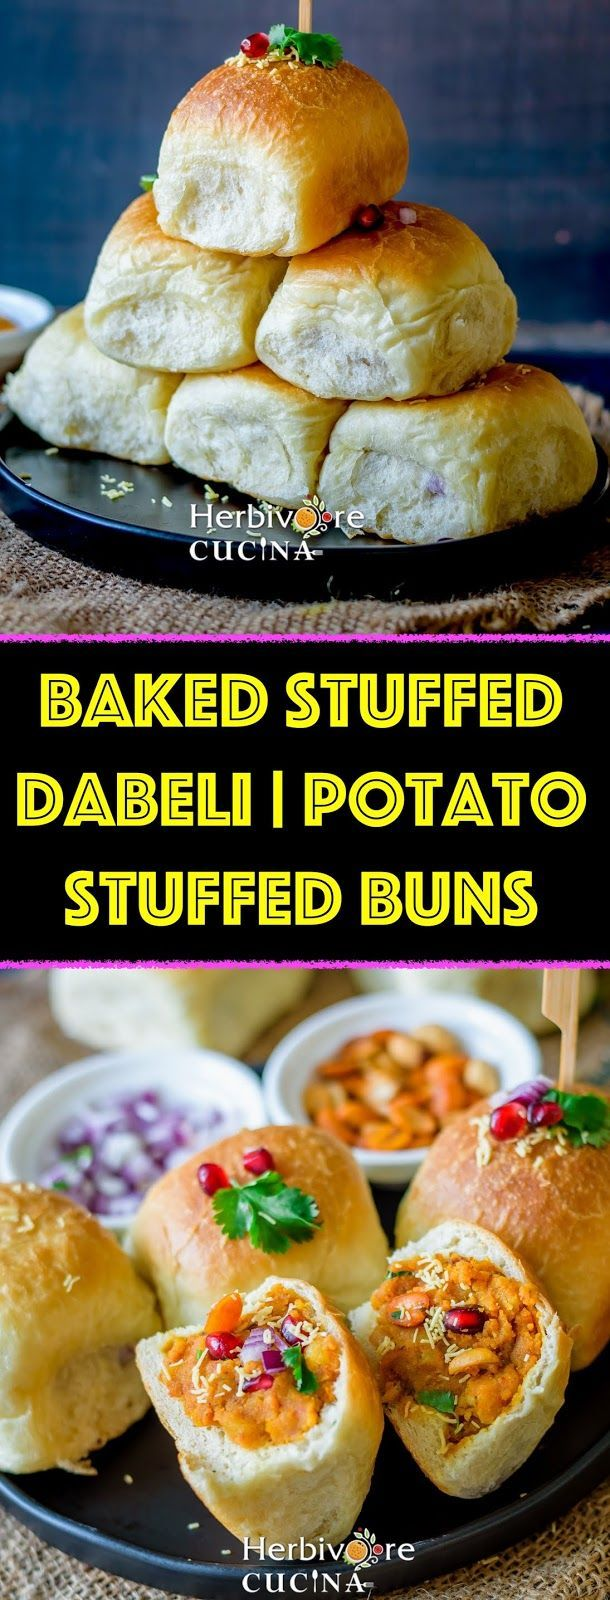 Baked Stuffed Dabeli Potato Stuffed Buns Dabeli Sweet And Spicy Recipes